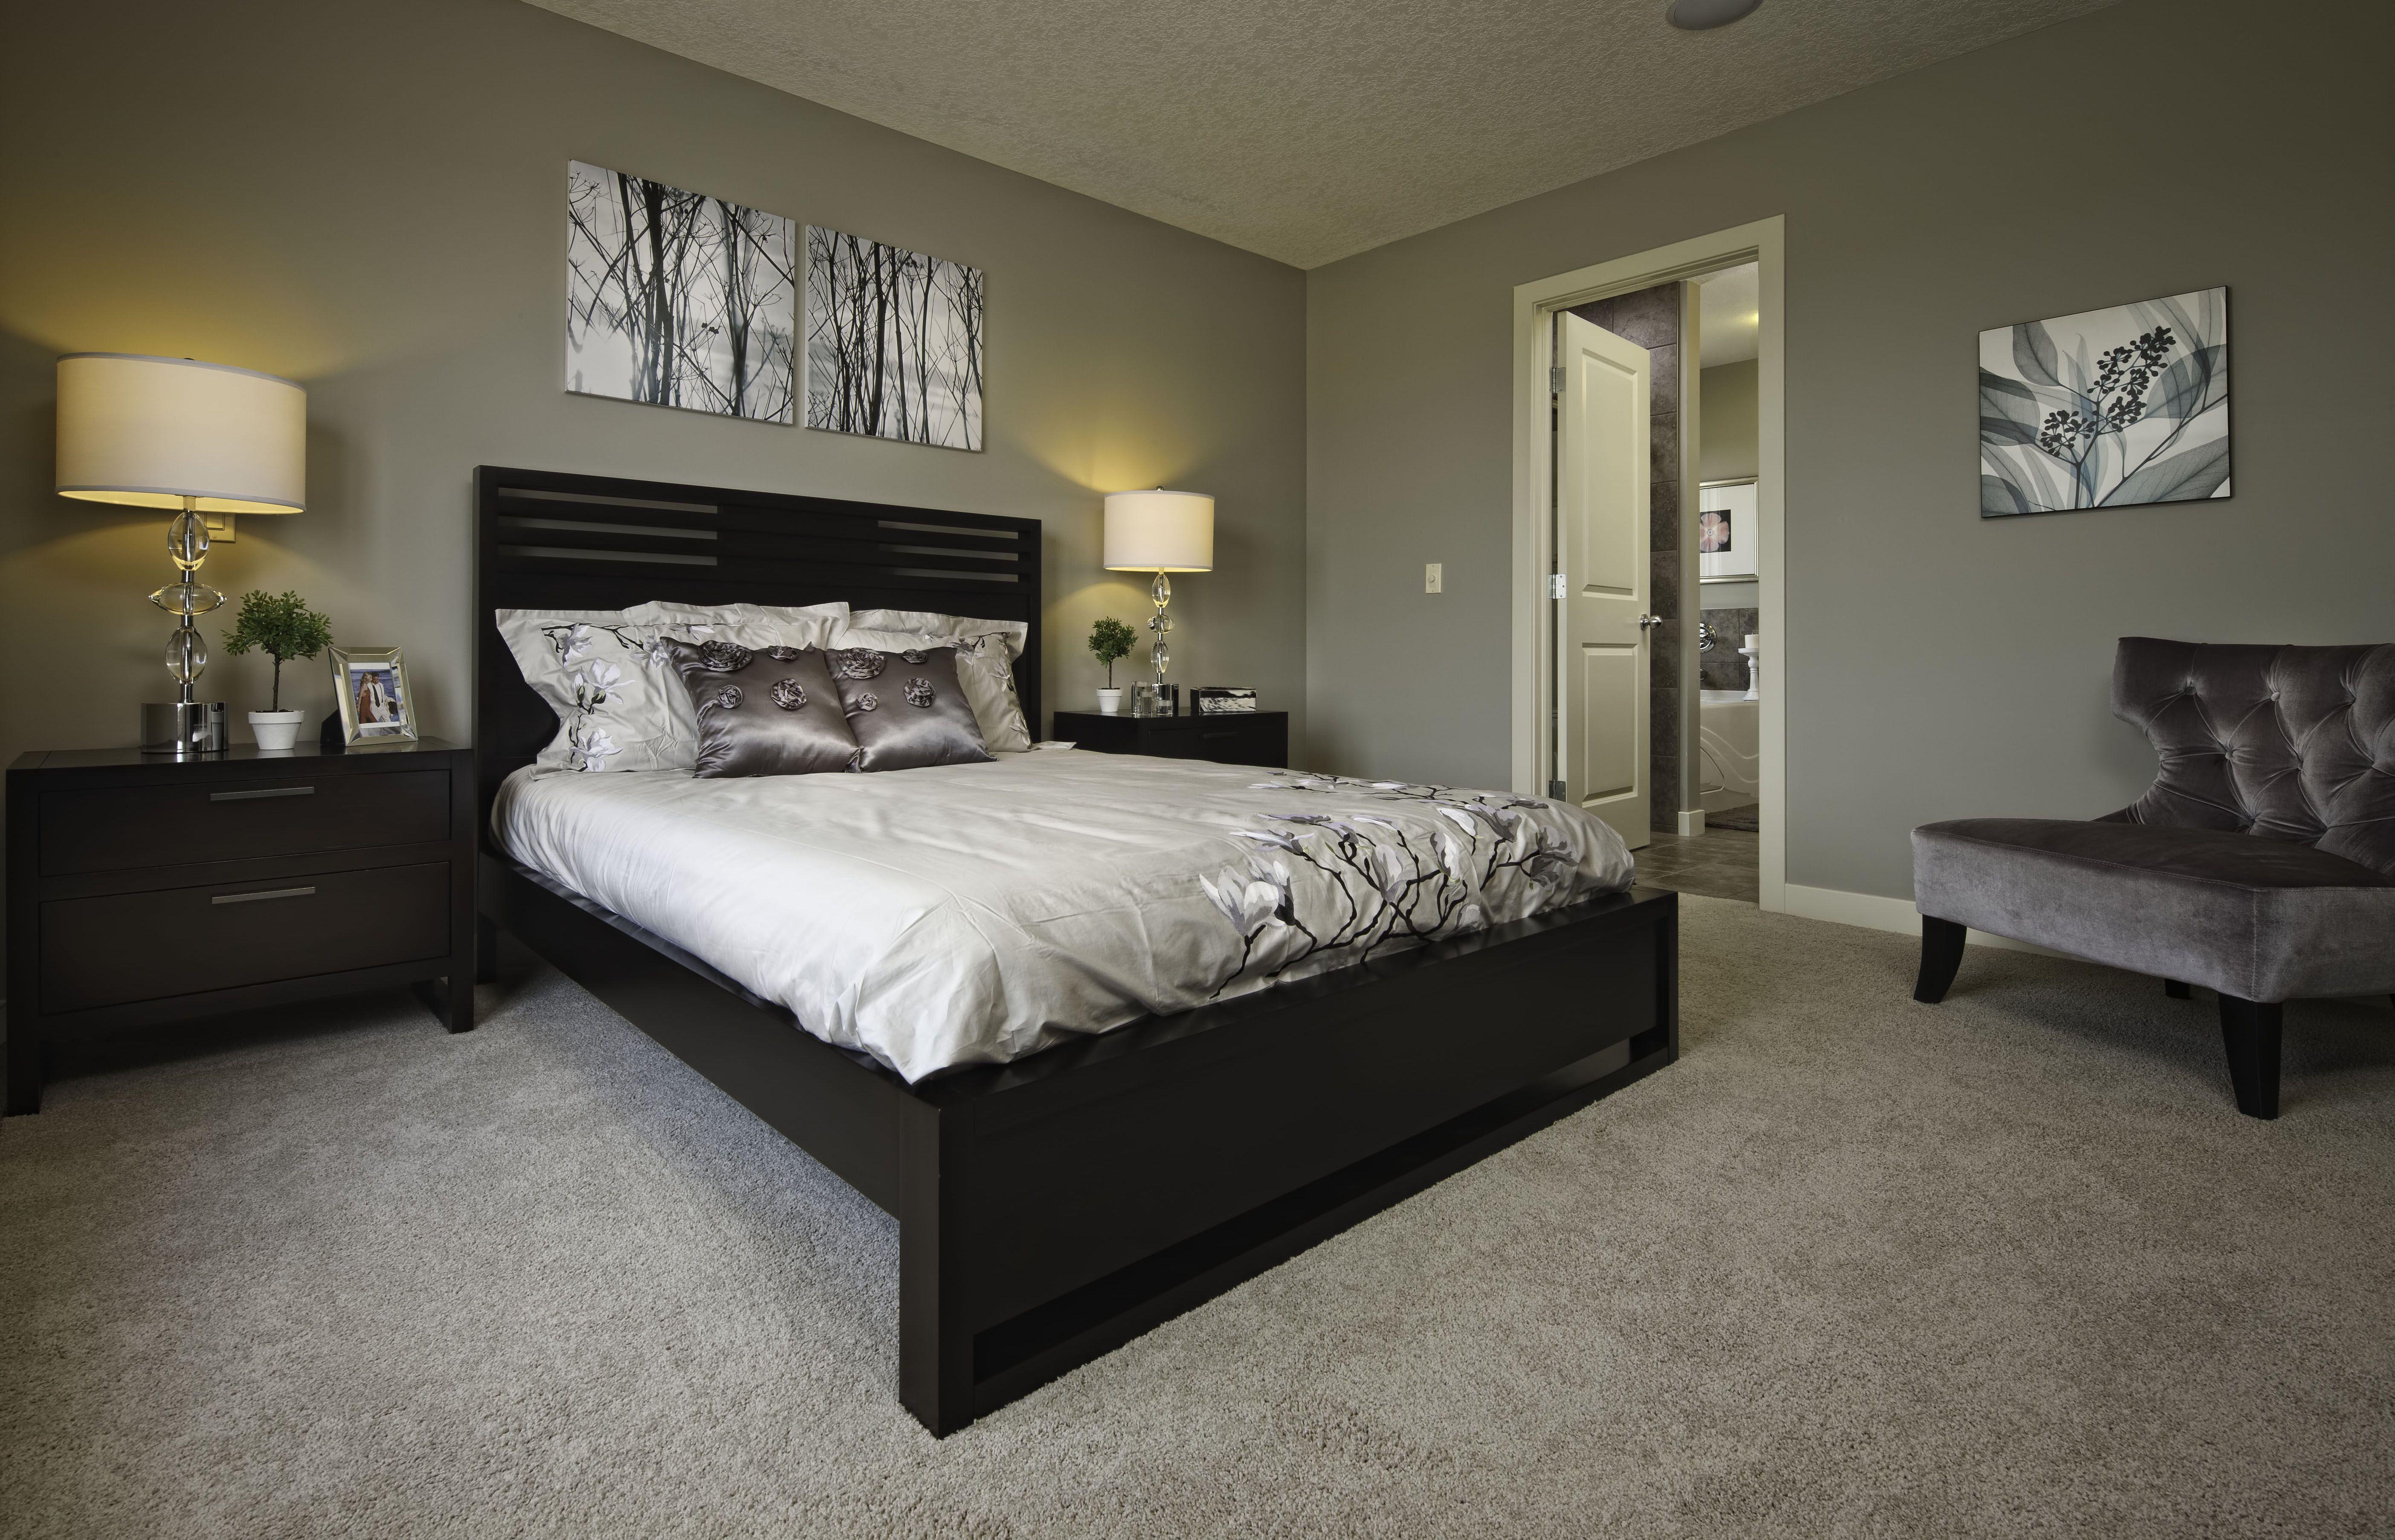 Master Bedroom Glamourous bedroom, Glamorous room